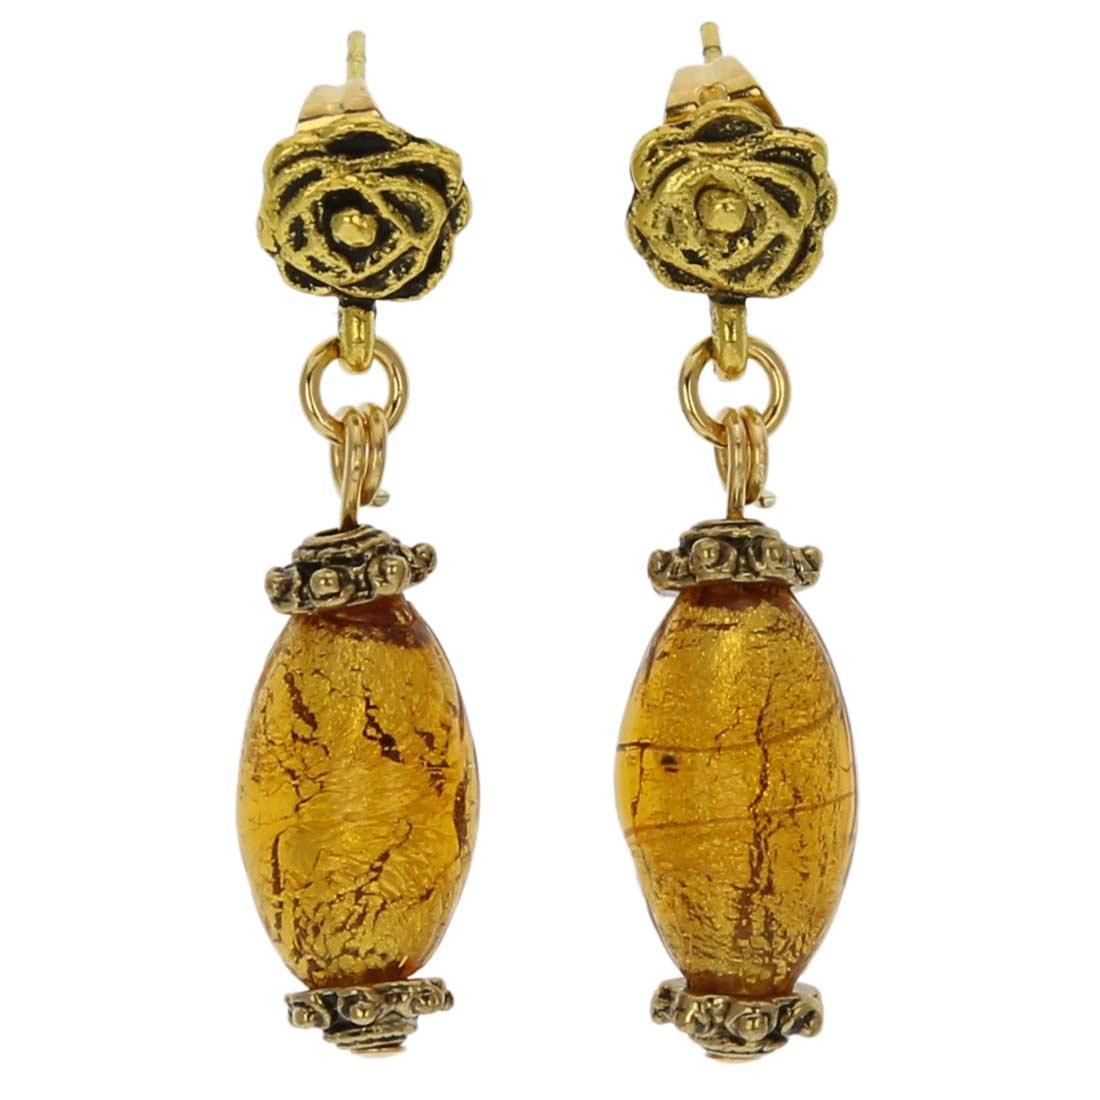 Antico Tesoro olives earrings -amber gold